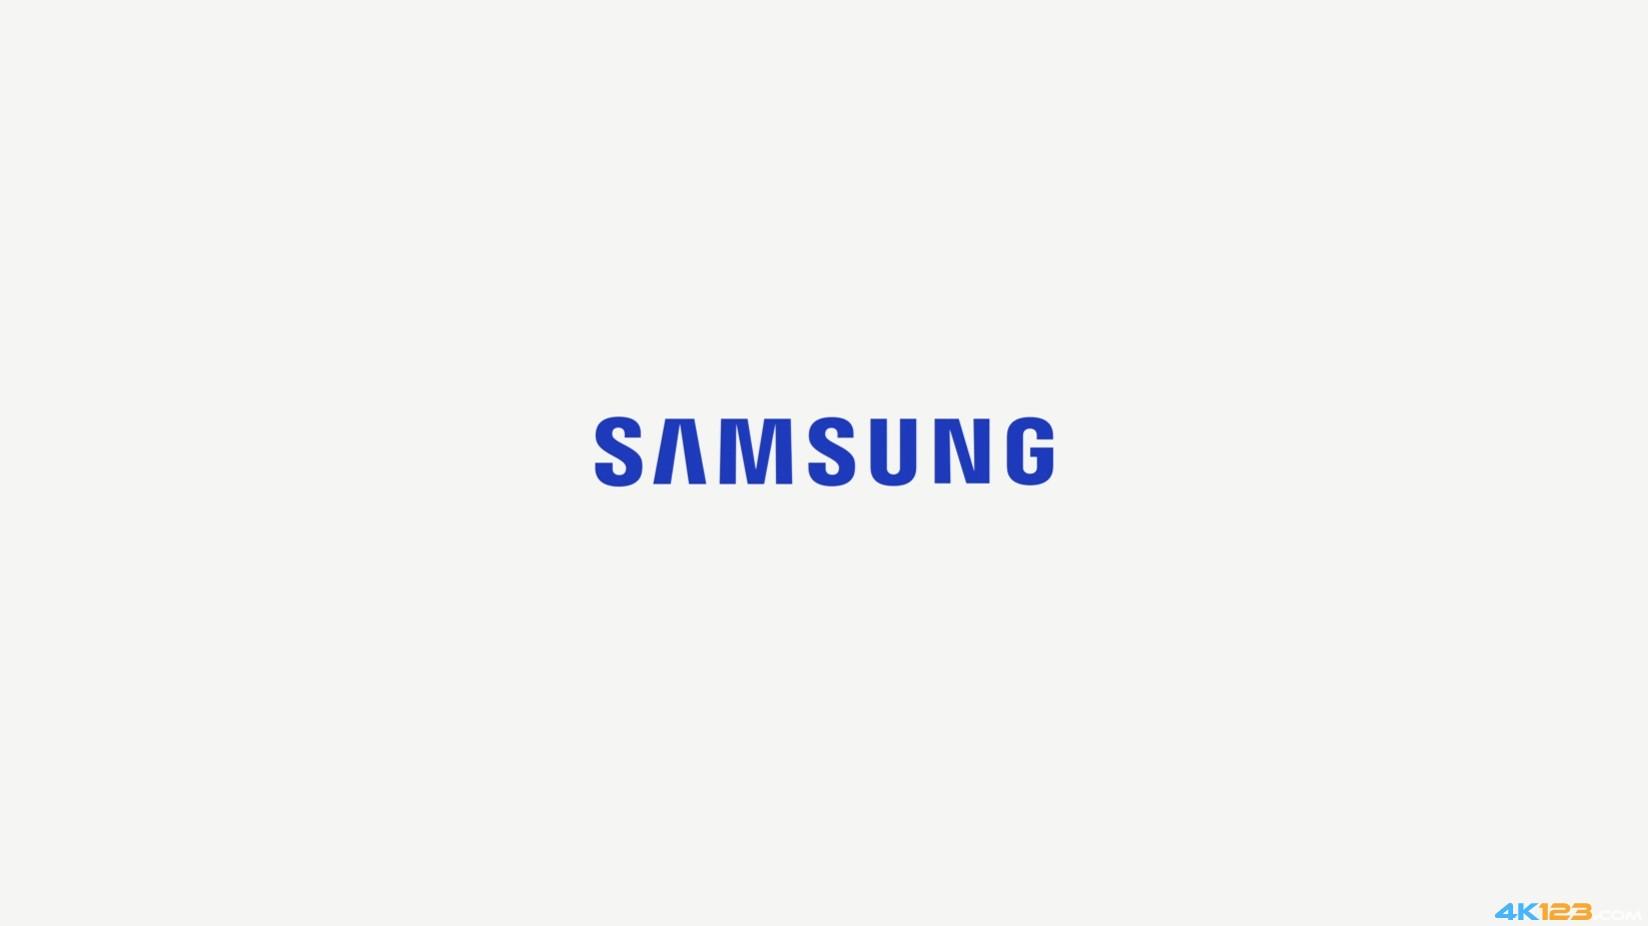 SAMSUNG.QLED.4K.HDR.DEMO_Wonderland.Two.ts_2018_11.jpg